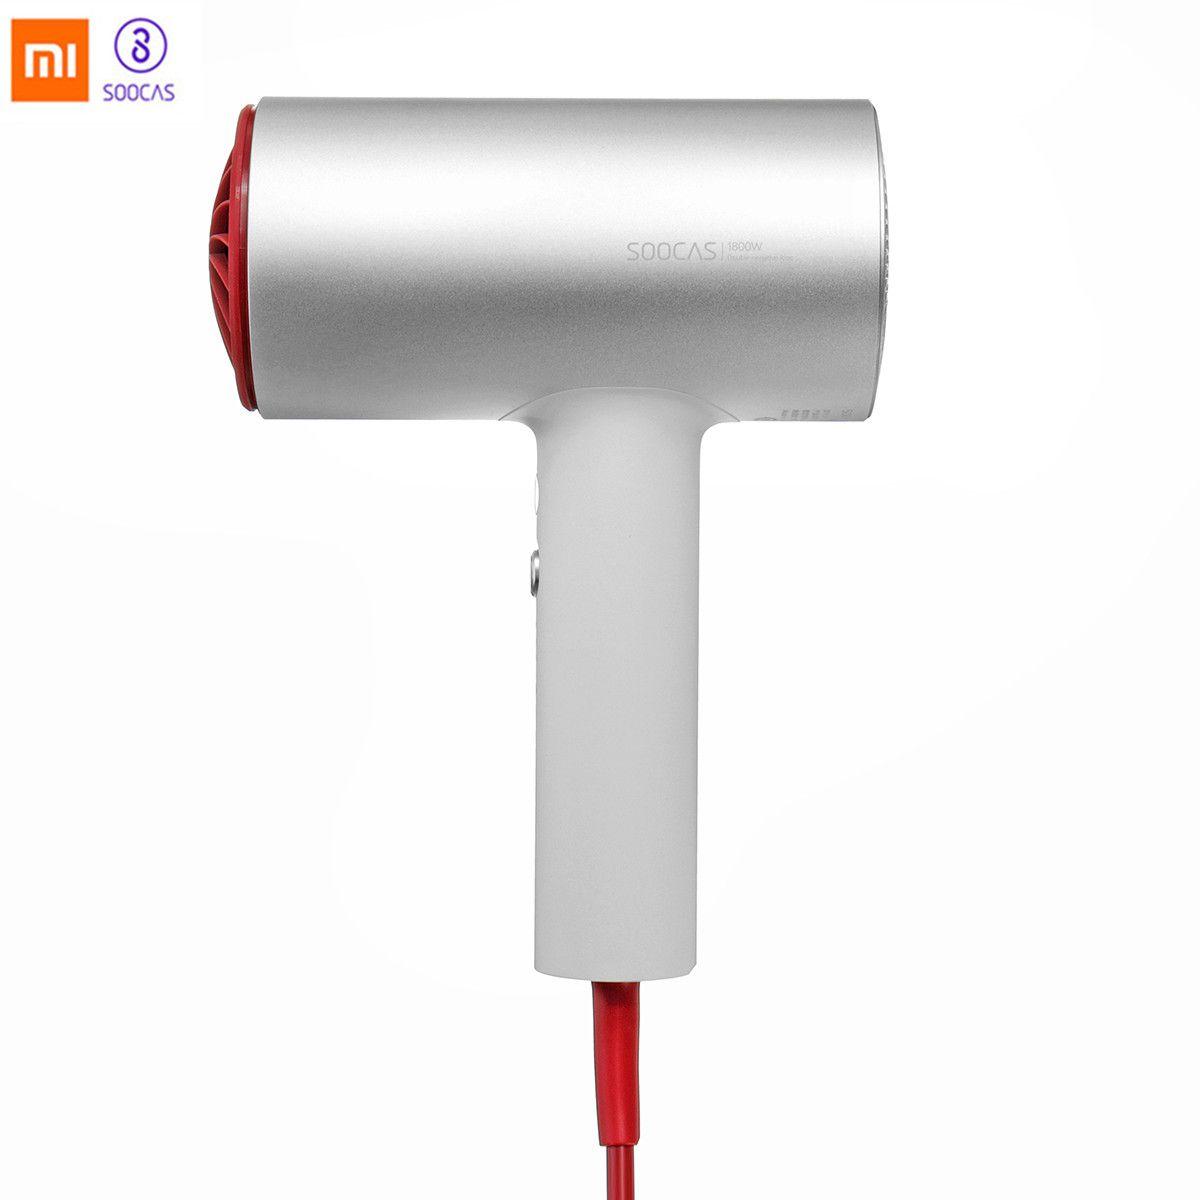 Xiaomi International Edition Soocas H3 Original Anion Hair Dryer Quick-dry Hair Tools 1800W Air Outlet Anti-Hot Innovative EU